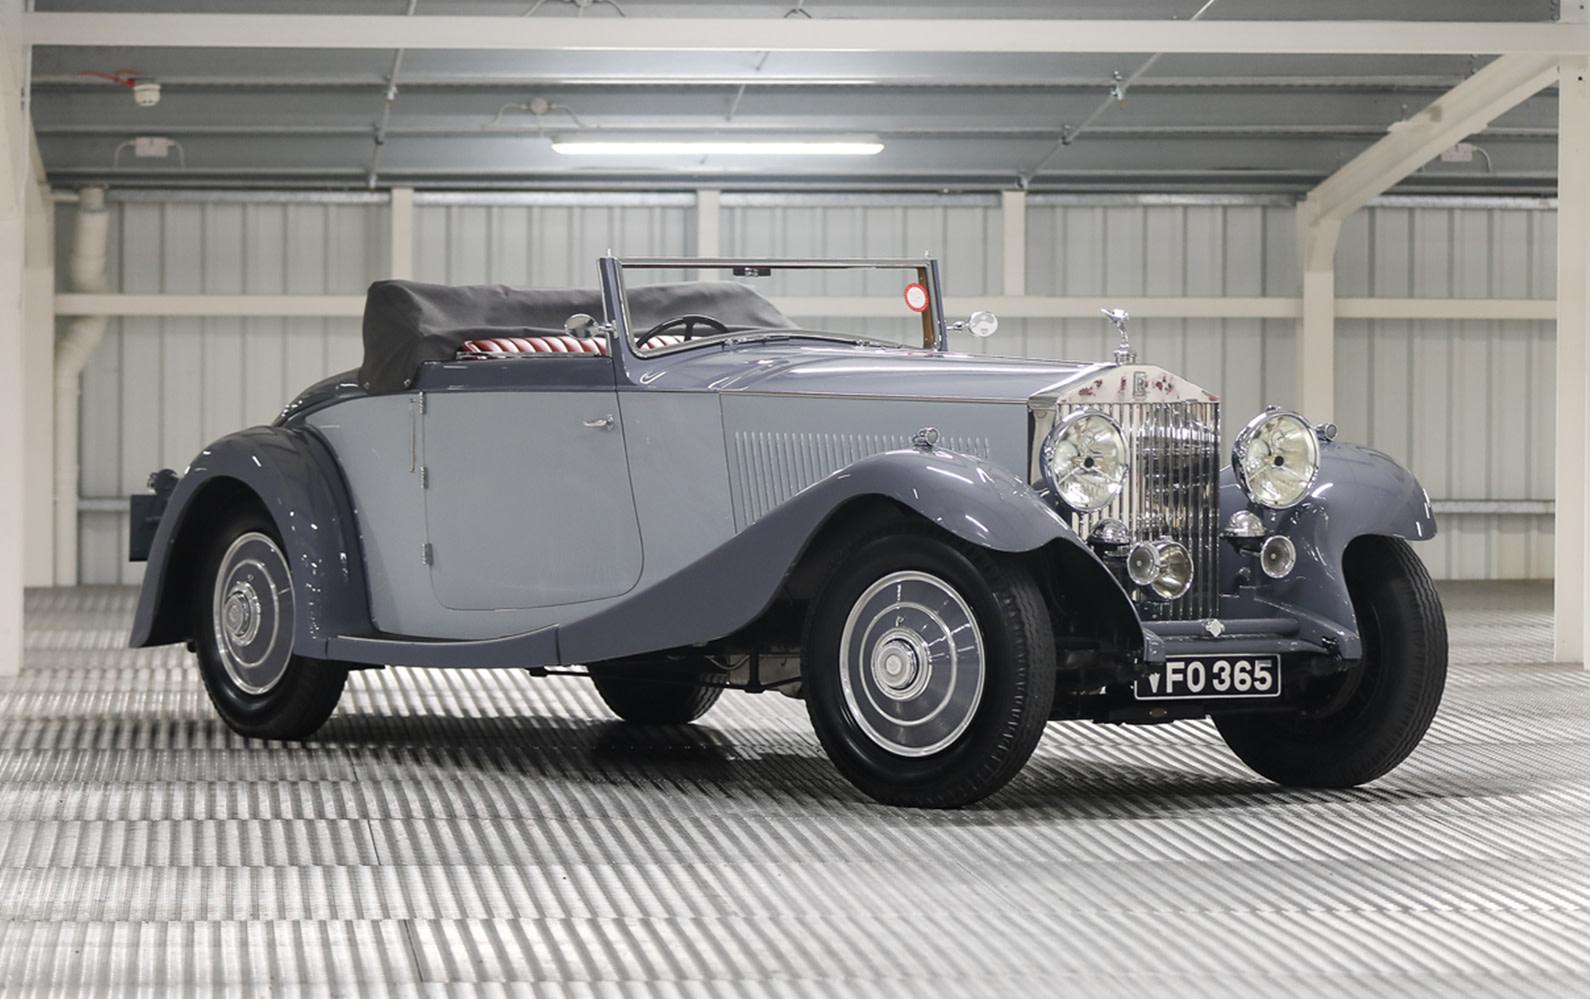 Prod/O21B - UK 2021/1934 Rolls-Royce Phantom II Continental Drophead Coupe/1934_Rolls_Royce_Phantom_II_Continental_Drophead_Coupe_3_nmjjgg